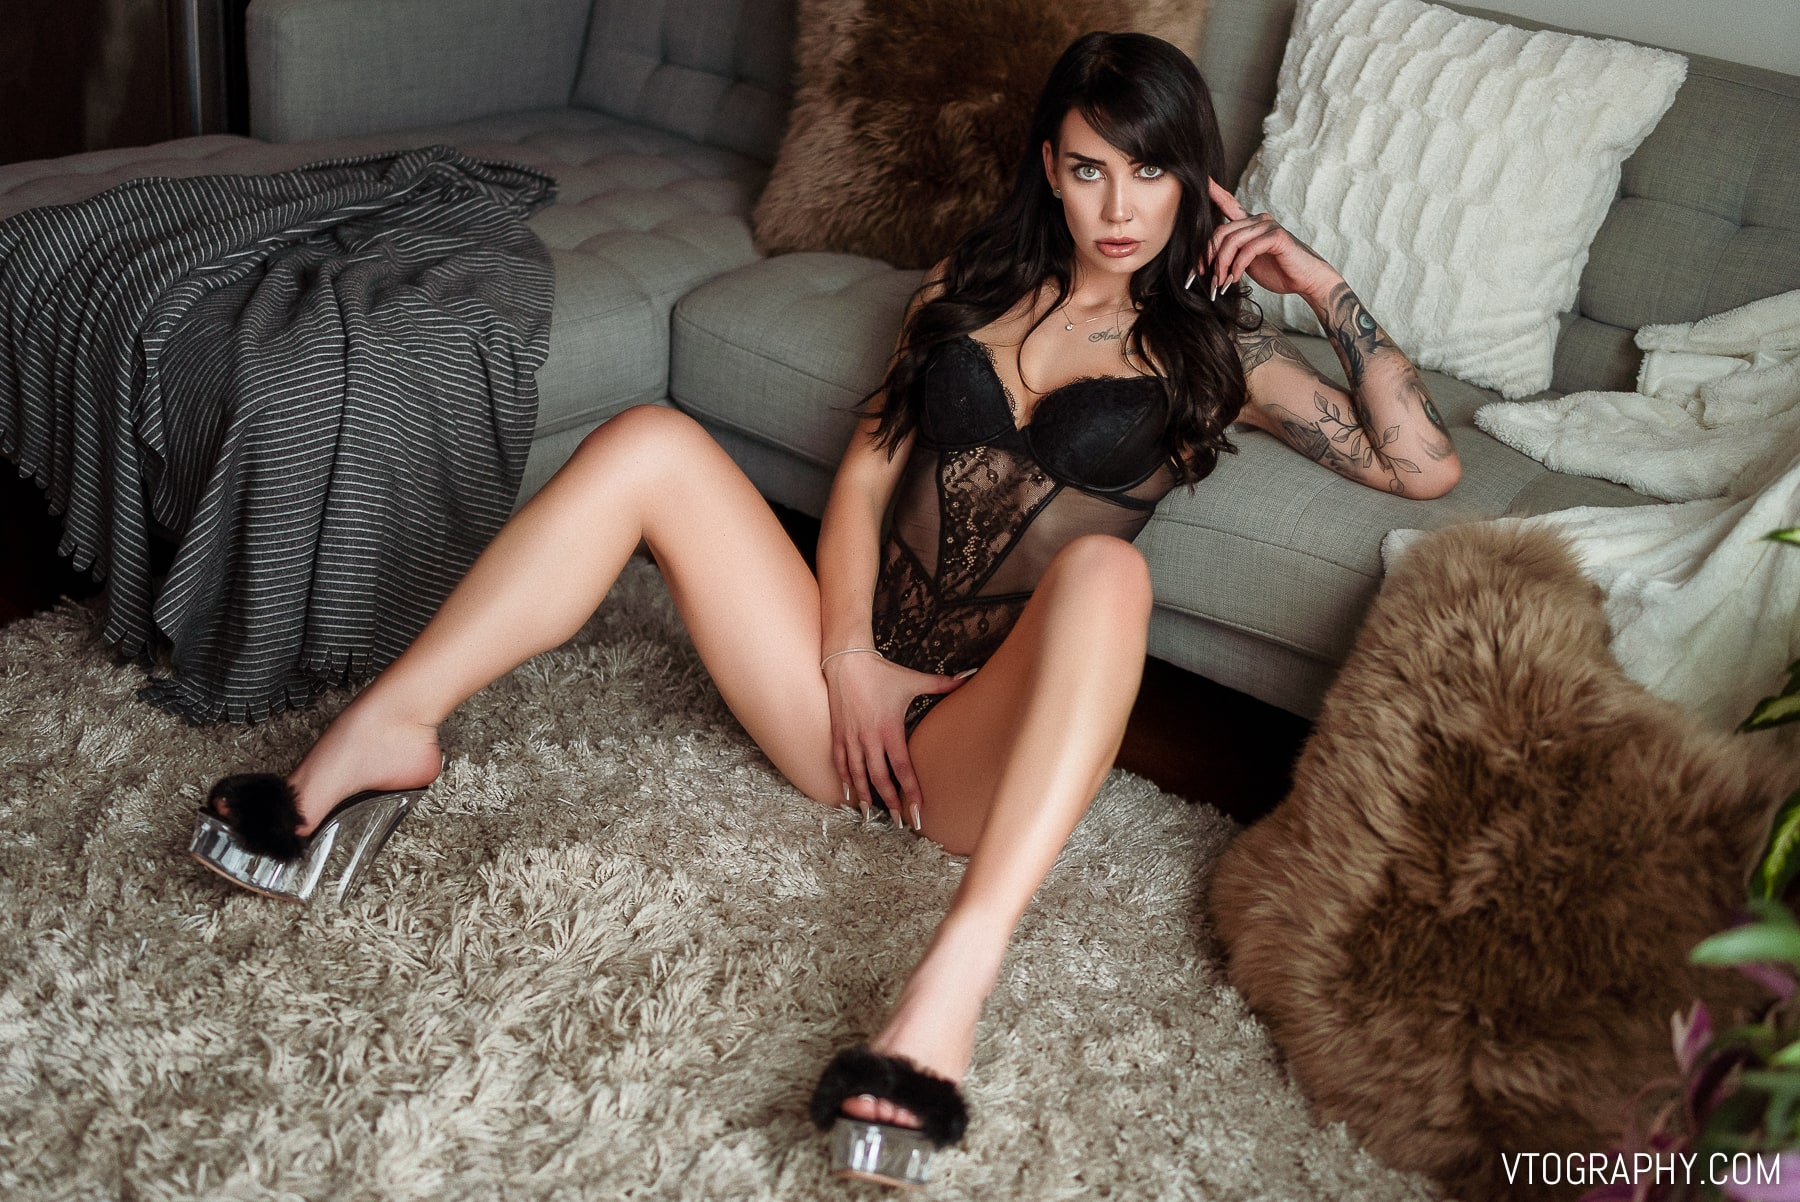 Tall, tattooed model Riley in lingerie